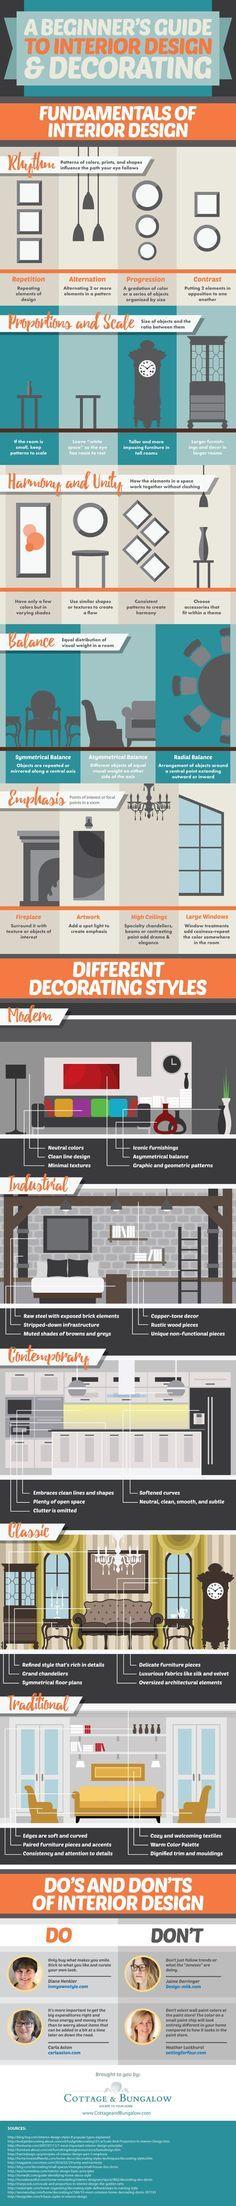 Farfan Counter Stool on OneKingsLane Remodel Ideas Pinterest - moderne schlafzimmer einrichtung tendenzen